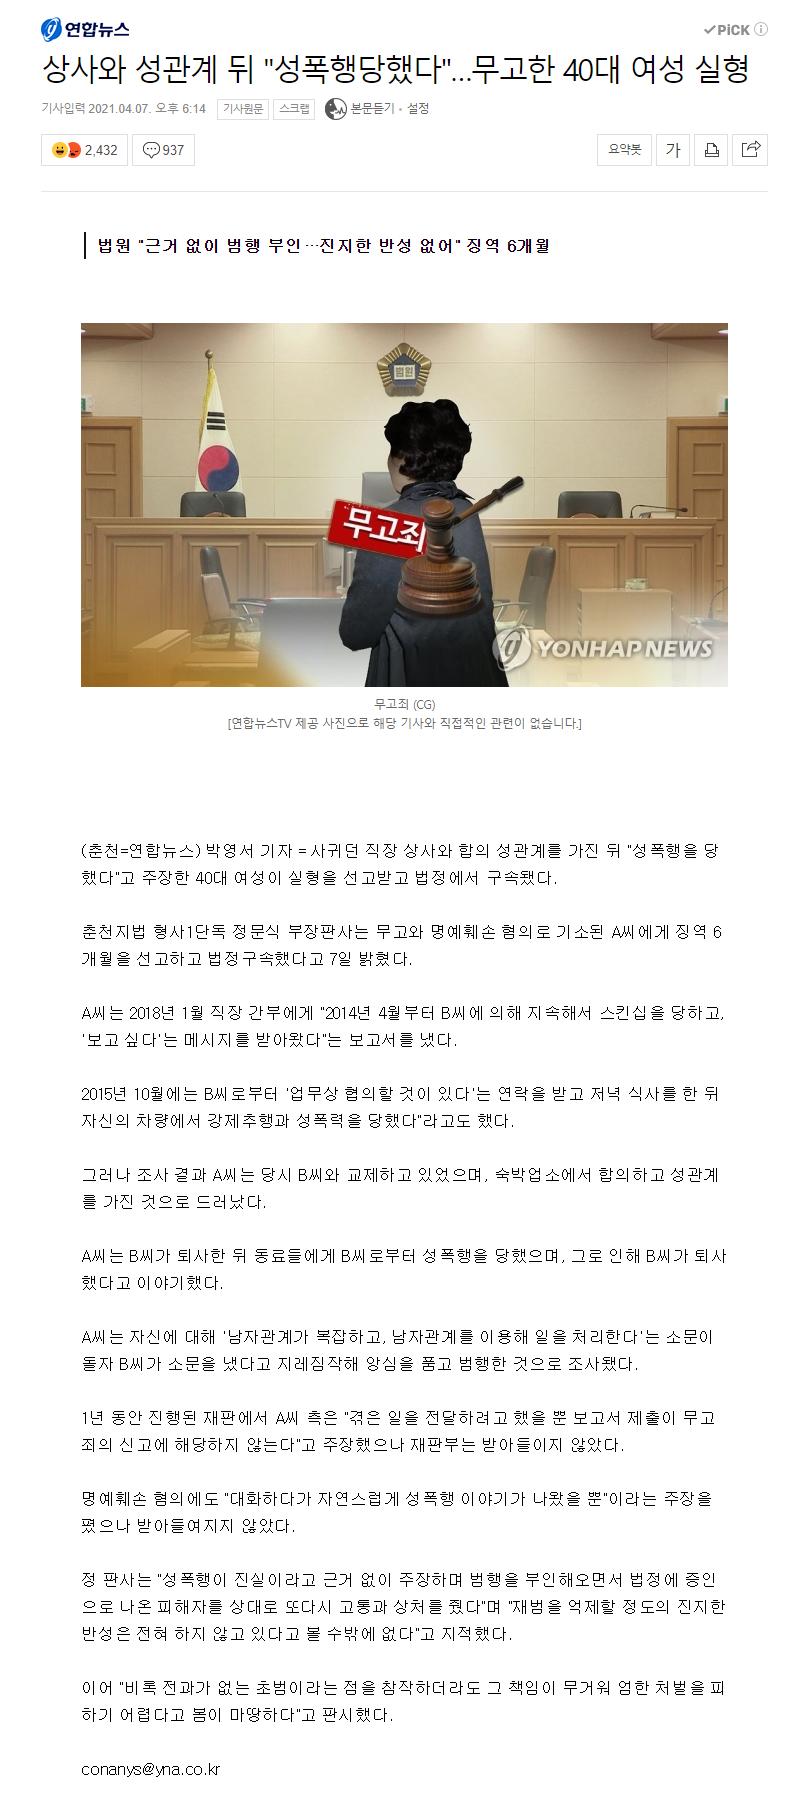 screenshot-news.naver.com-2021.04.08-15_40_39.png